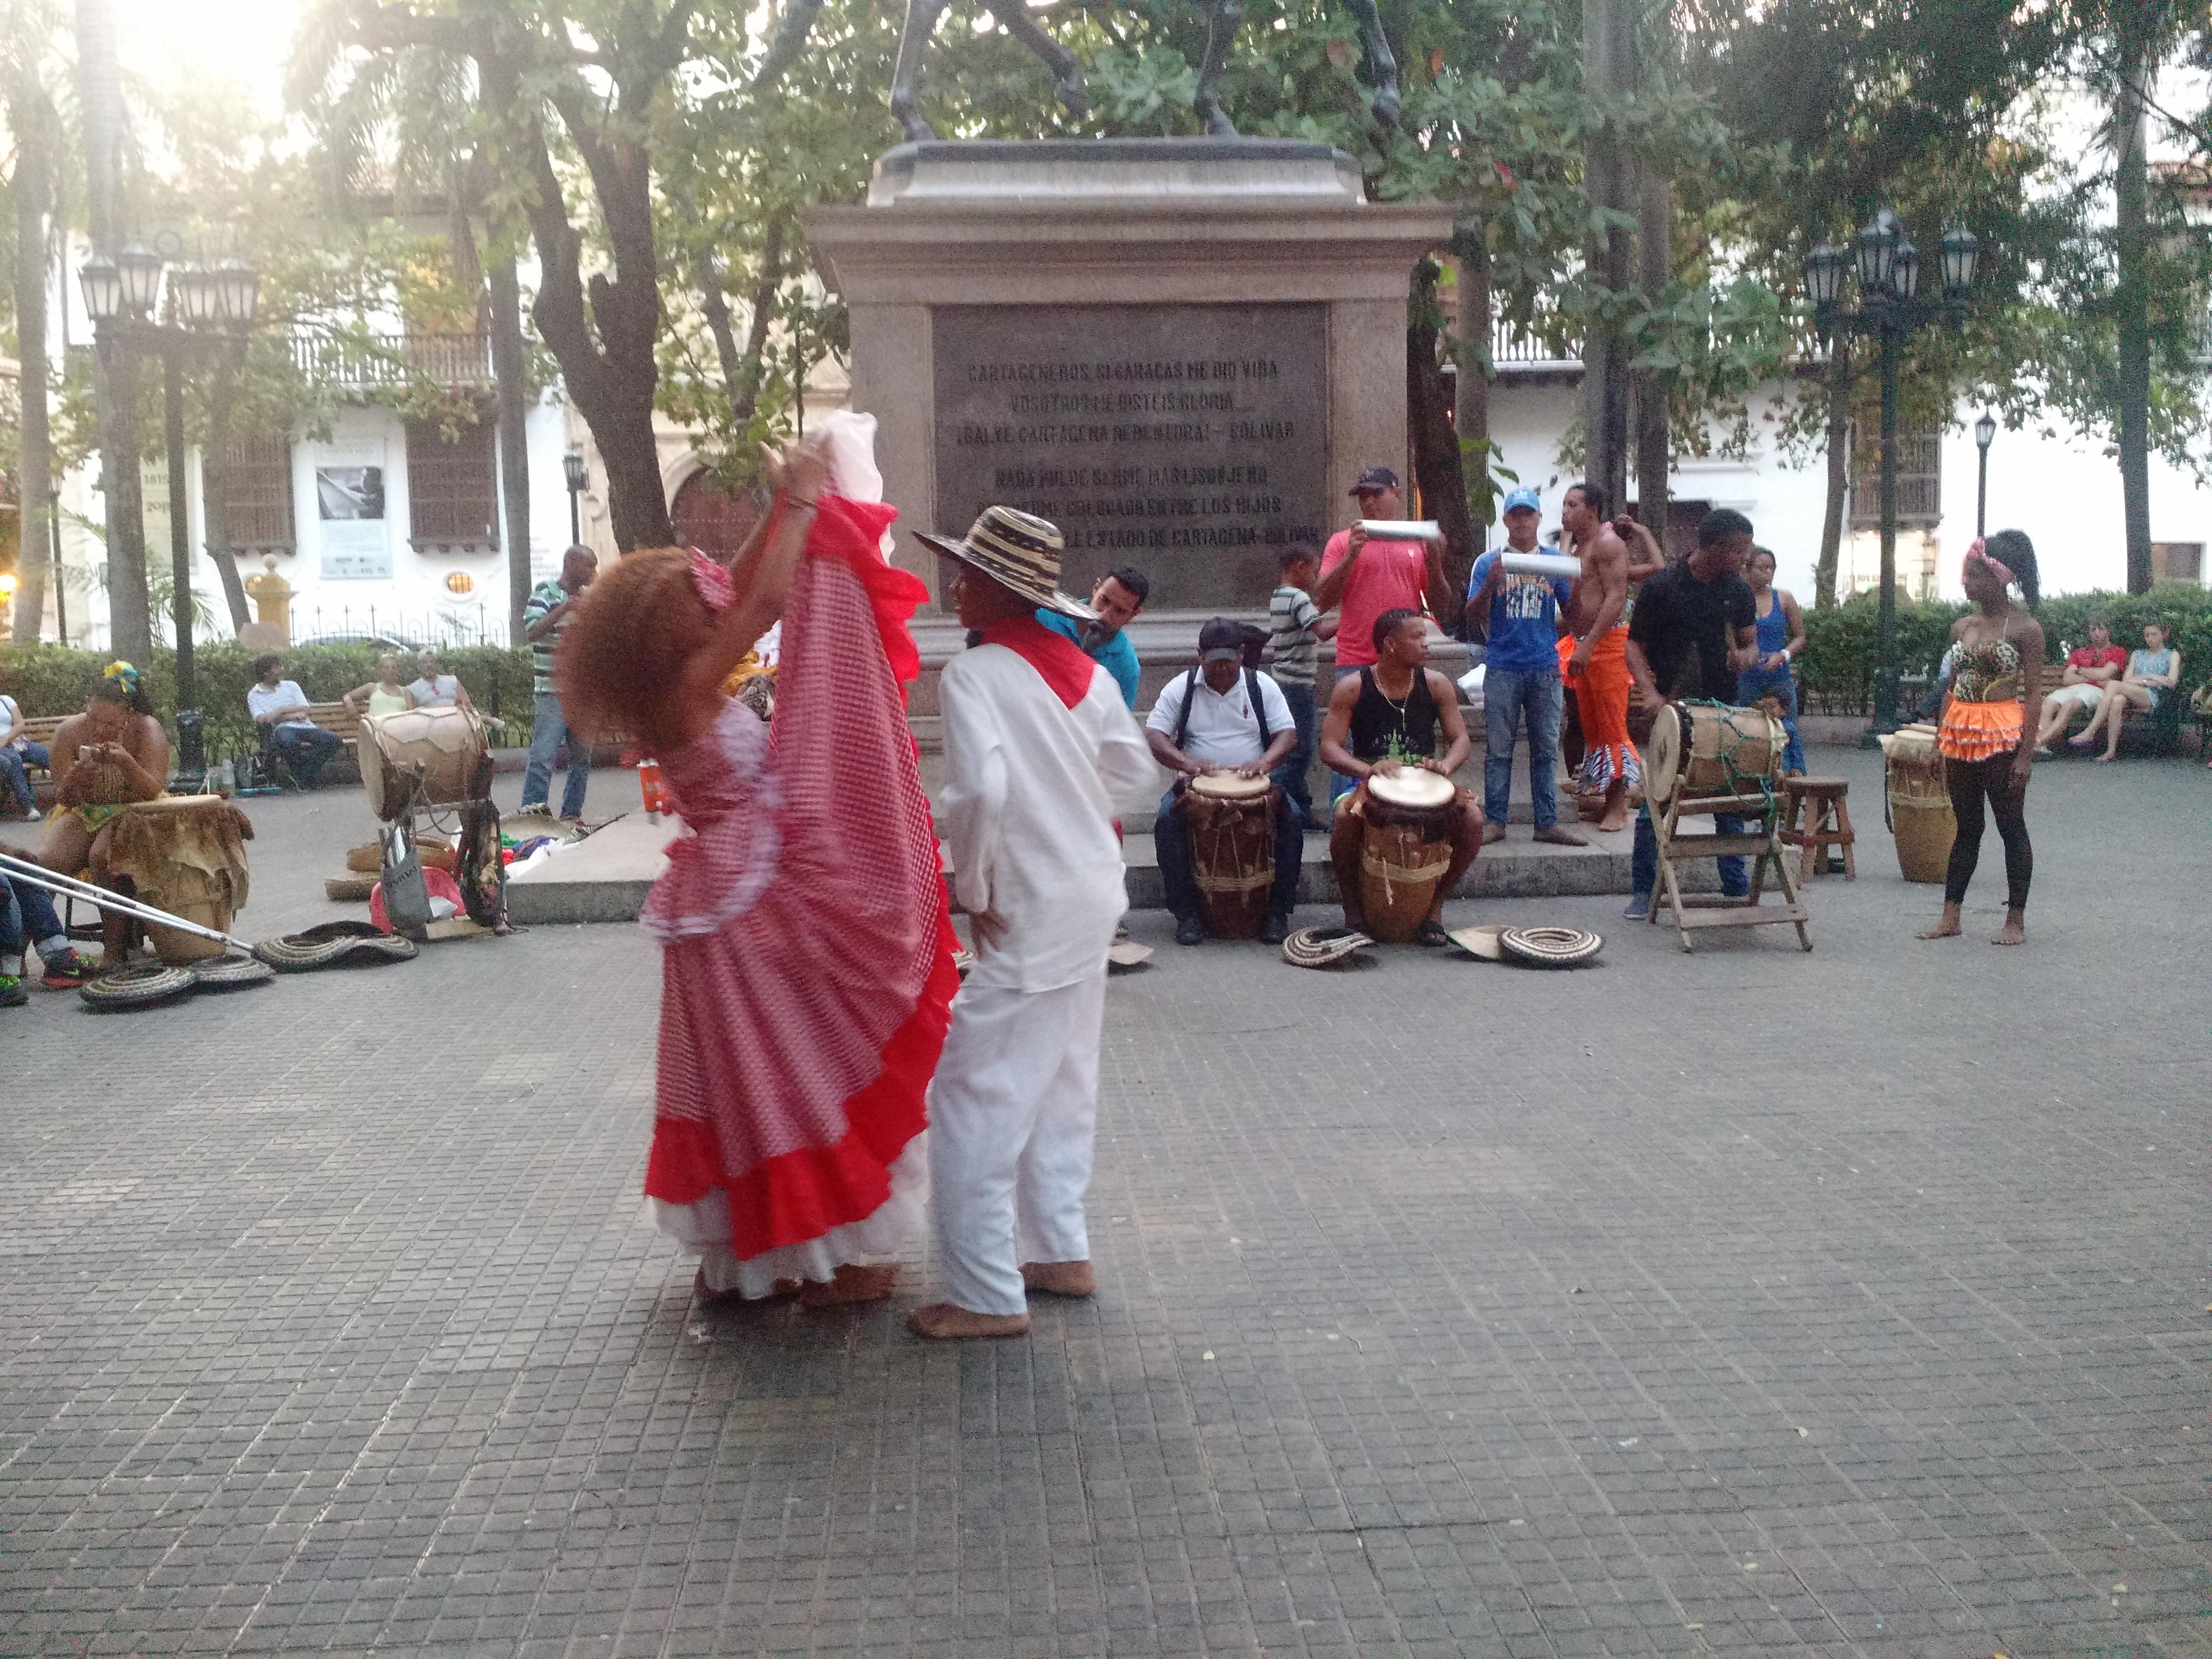 Cumbia dancers in Cartagena, Colombia